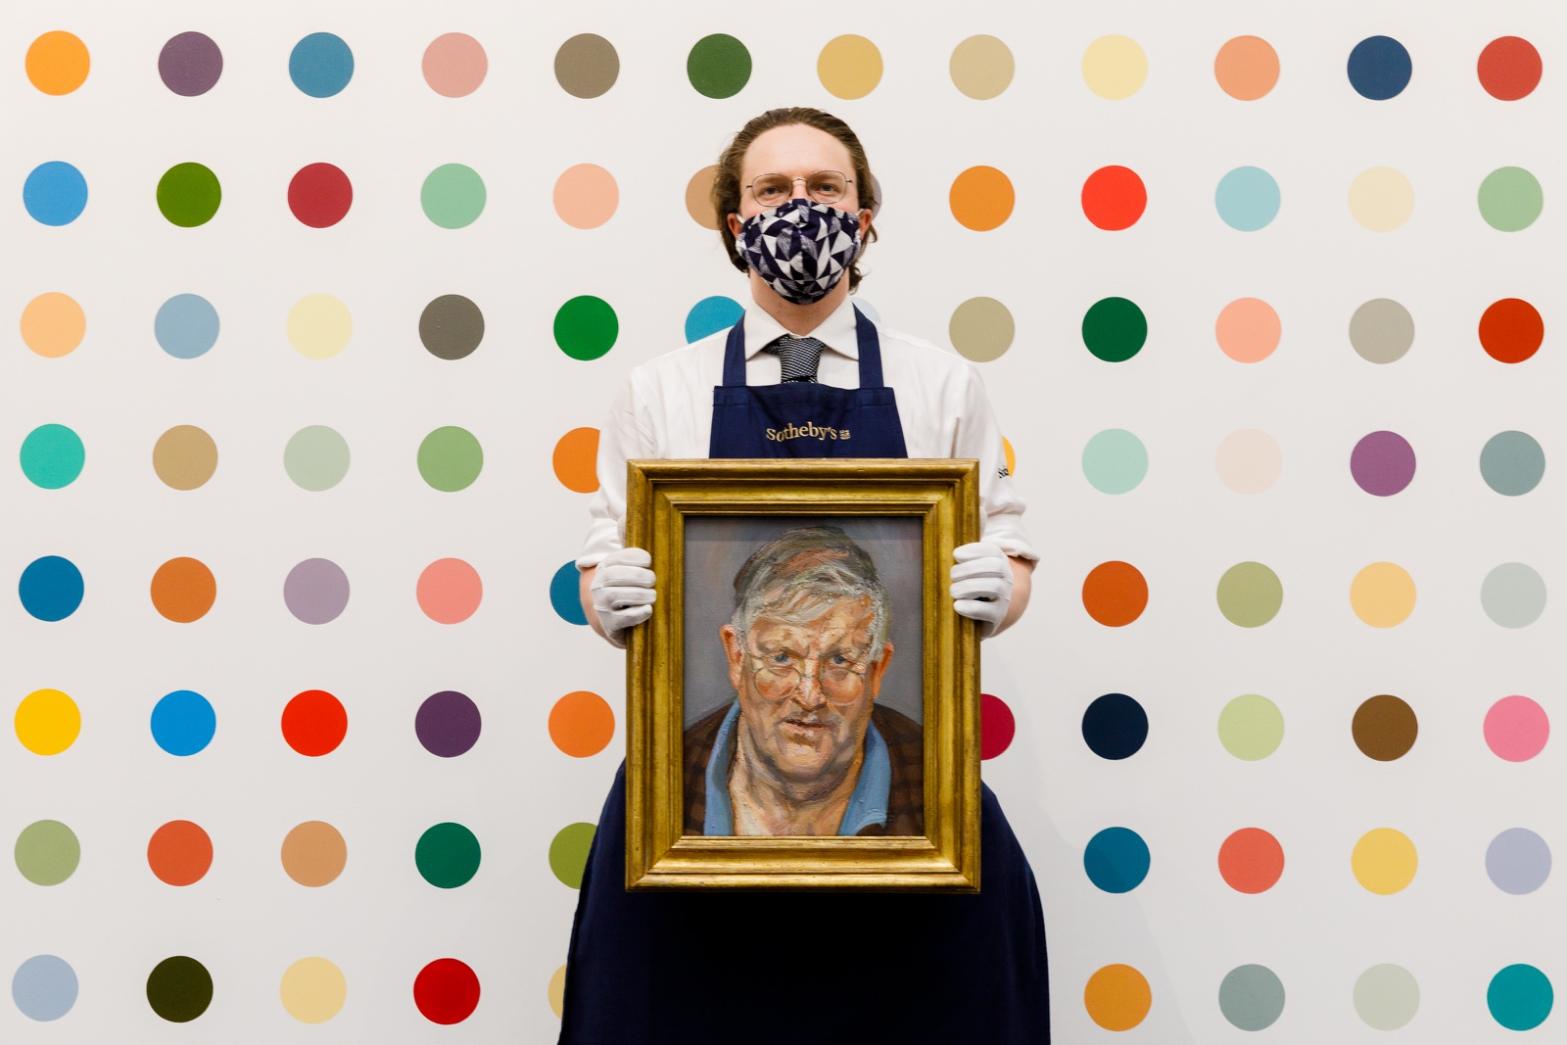 Lot 10- David Hockney, Lucian Freud, in situ 4.jpg